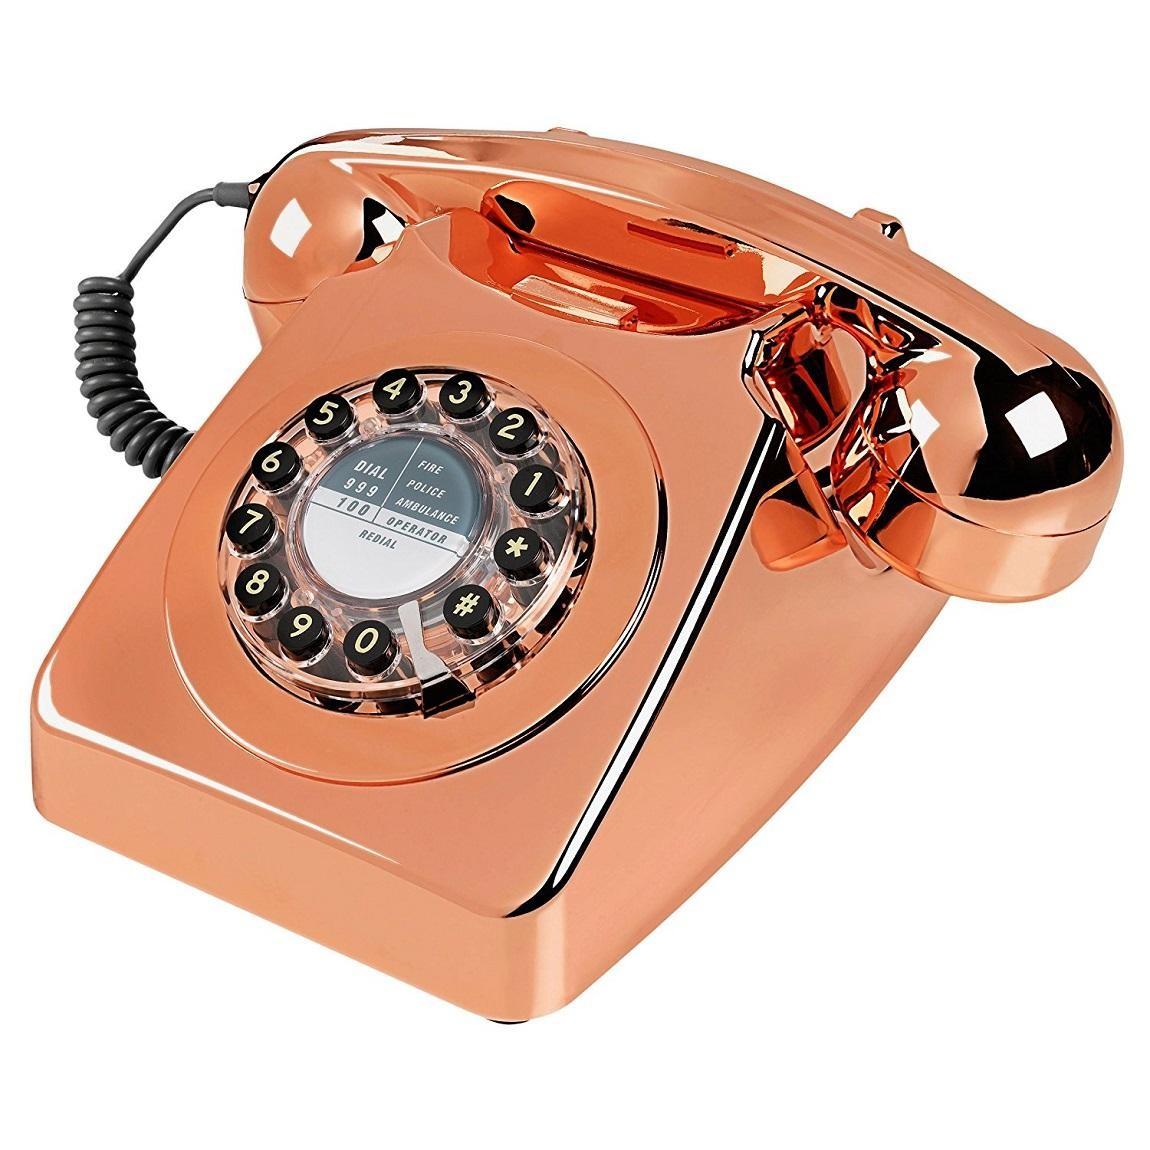 746-COPPER-Phone1.jpg